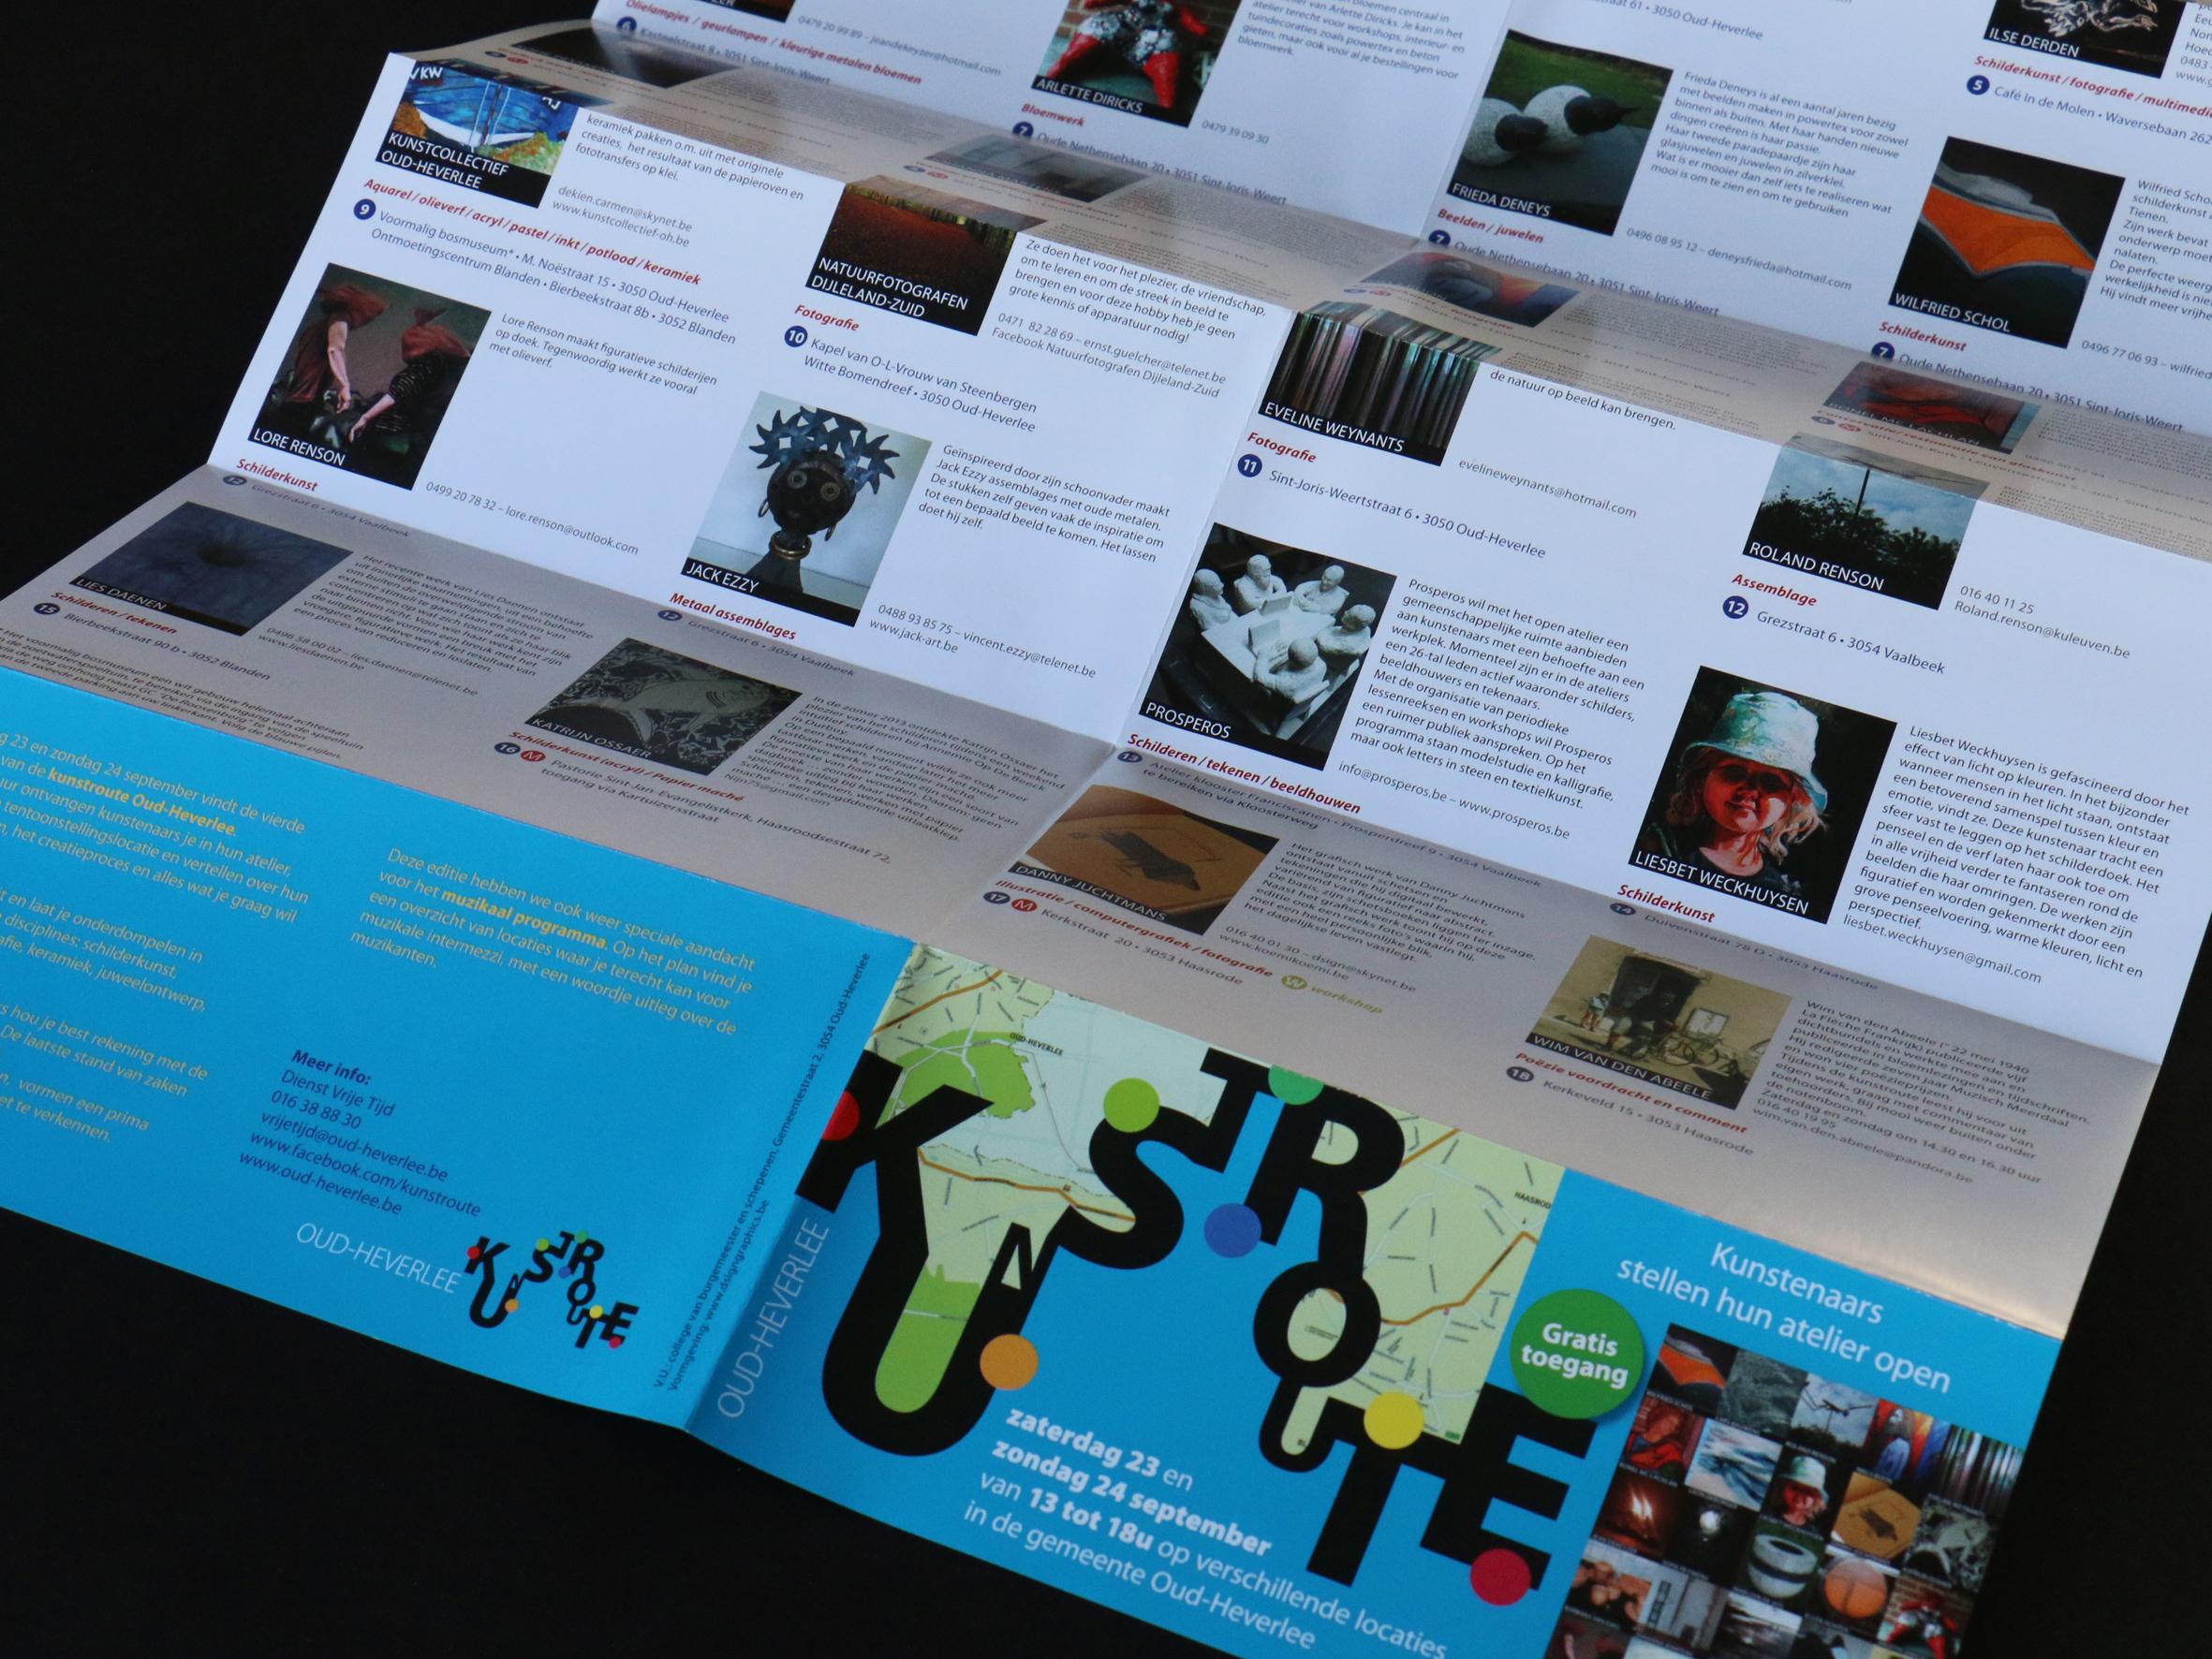 Folder Oud-Heverlee Kunstroute